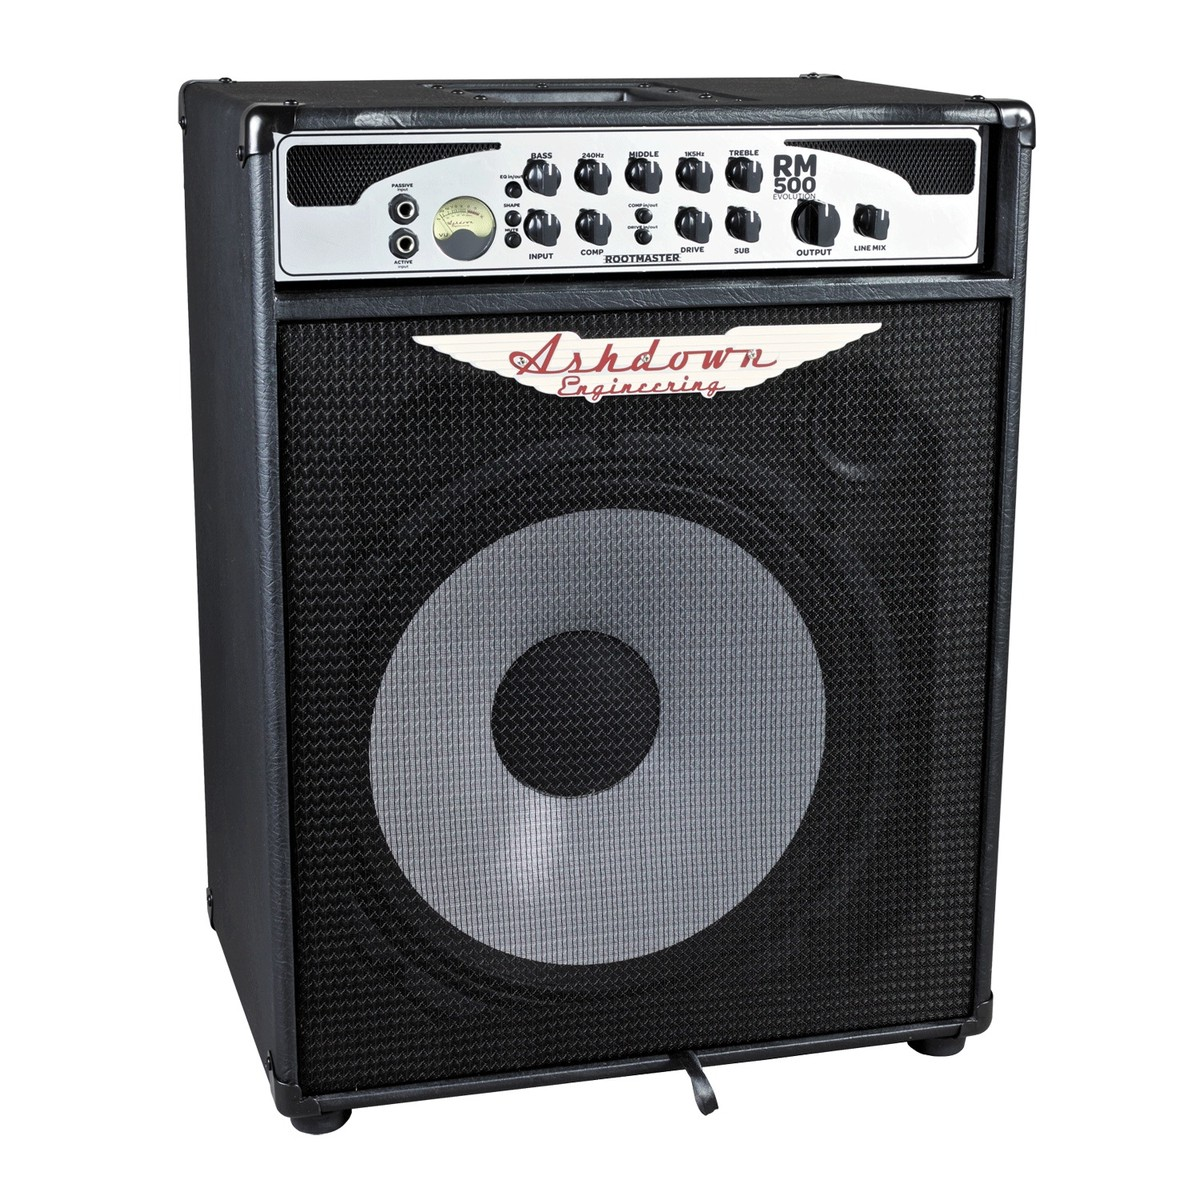 ashdown rm c115t 500 evo lightweight 500w 1 x 15 bass amp combo at. Black Bedroom Furniture Sets. Home Design Ideas